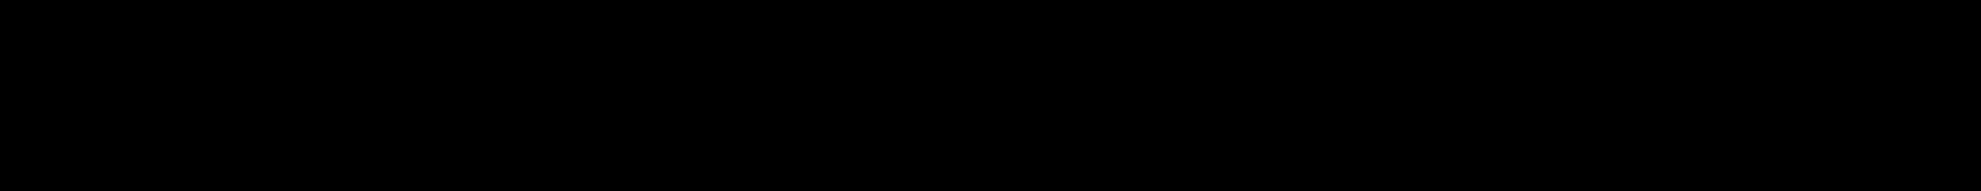 Design System C 900I